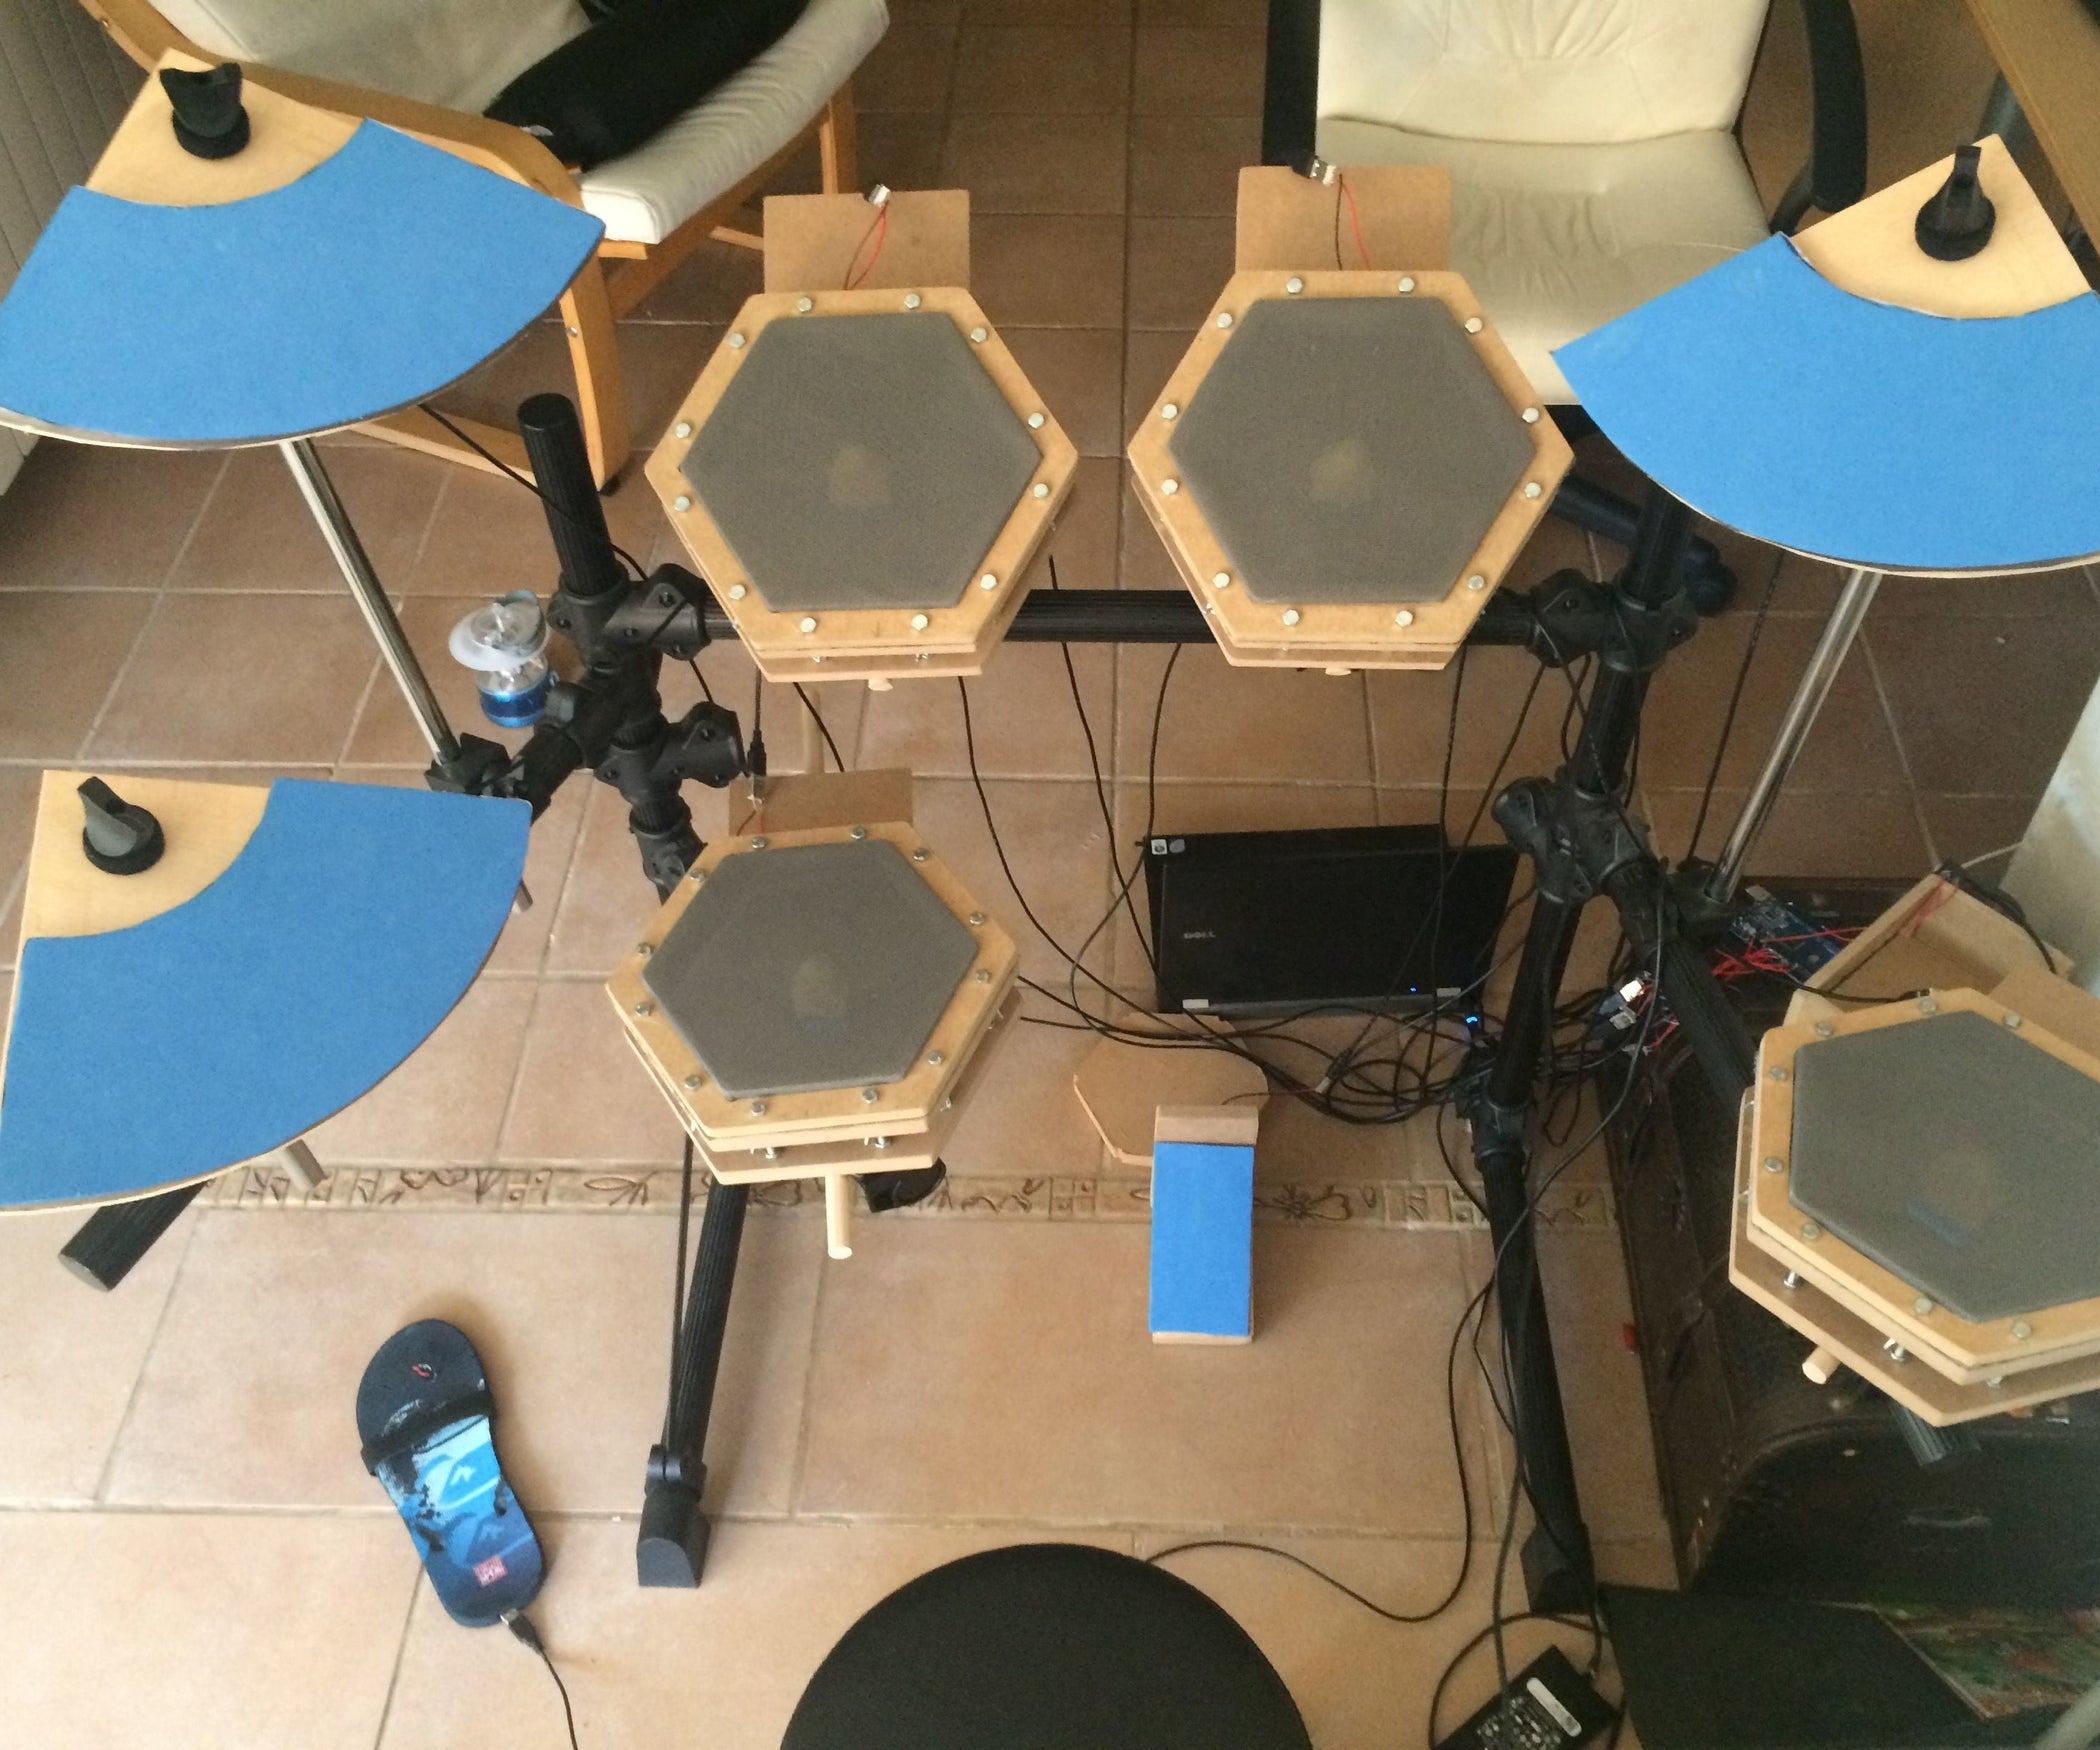 Homemade Electronic Drum Kit With Arduino Mega2560 DIY